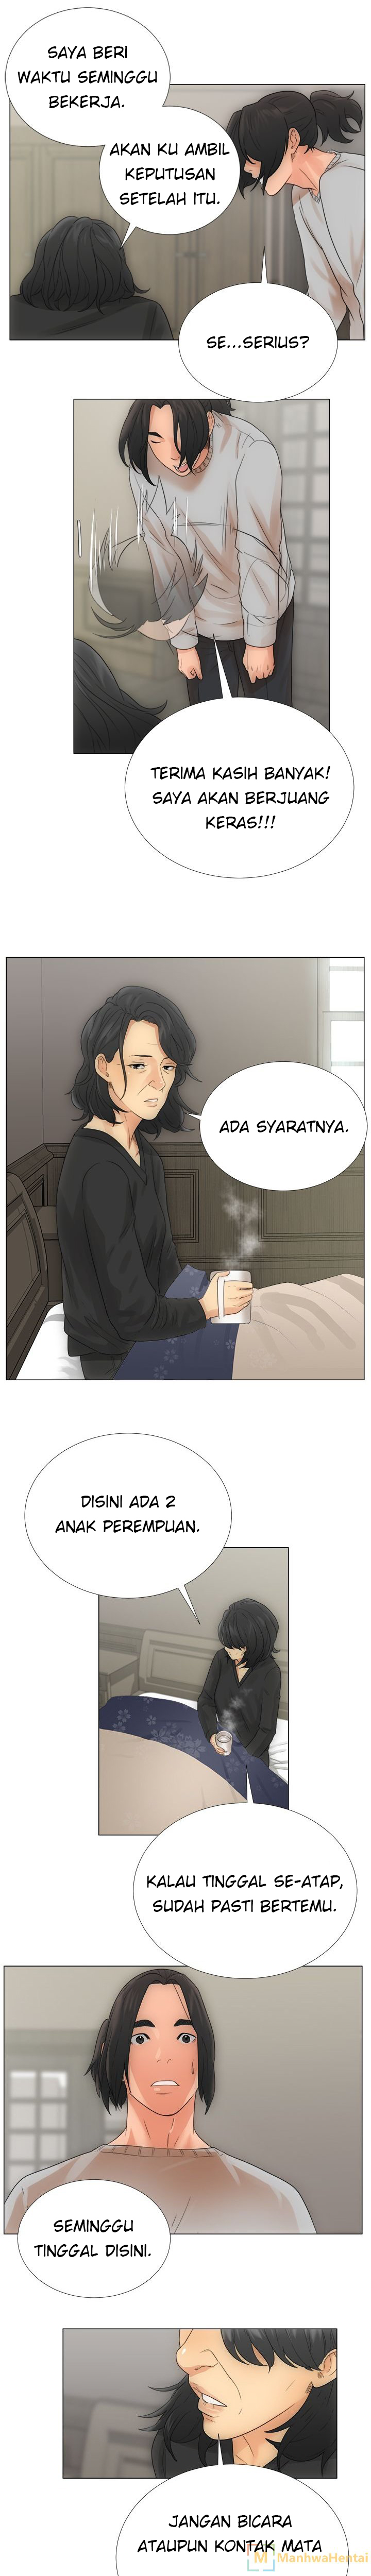 Lust Awakening Chapter 2 Bahasa Indonesia